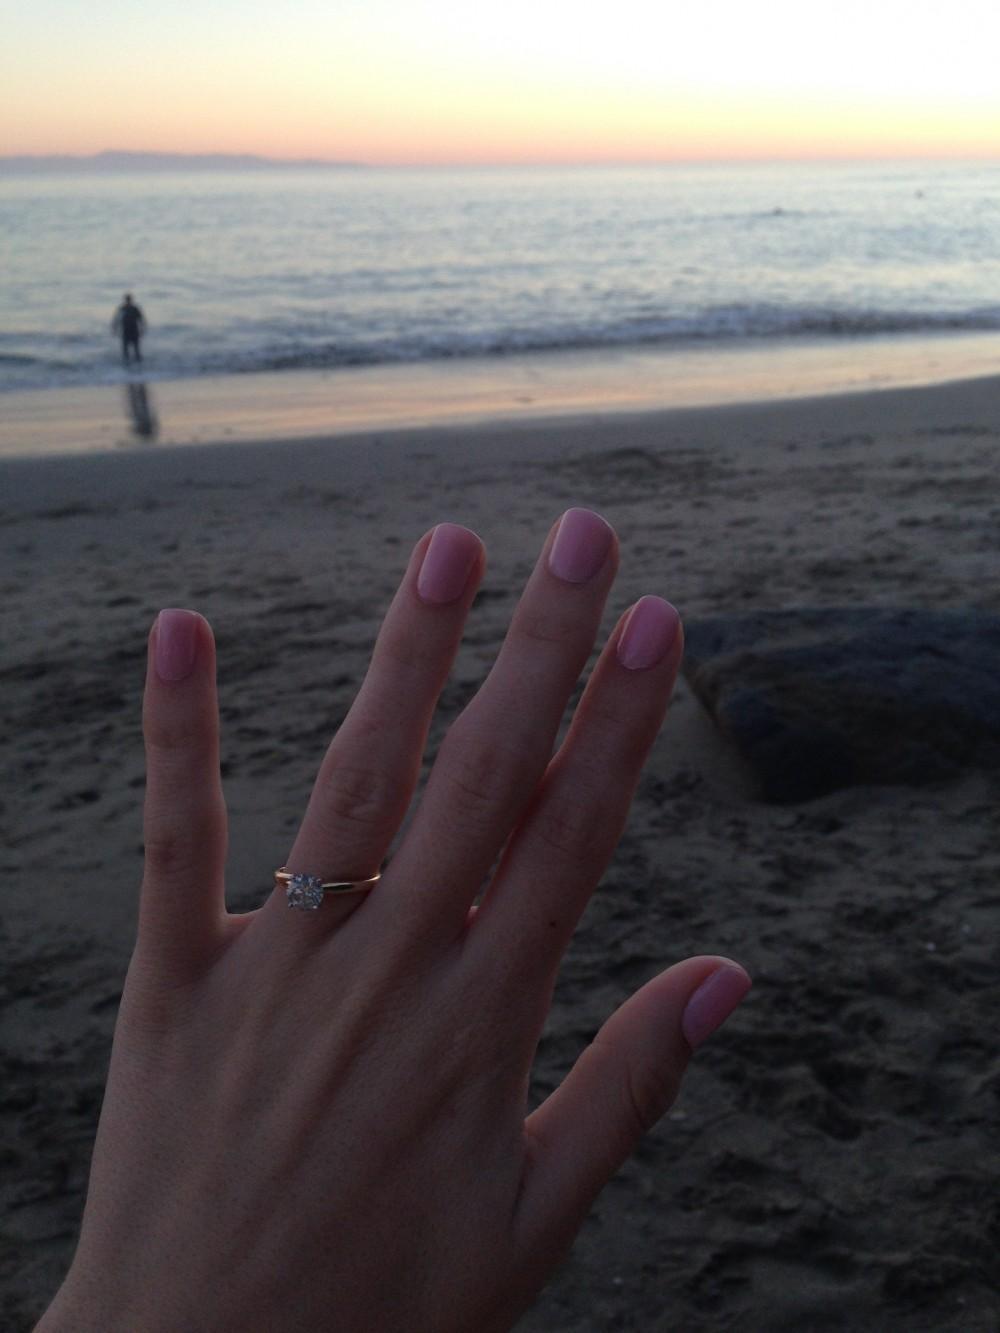 Image 8 of Bekka and John's Beach Day Proposal